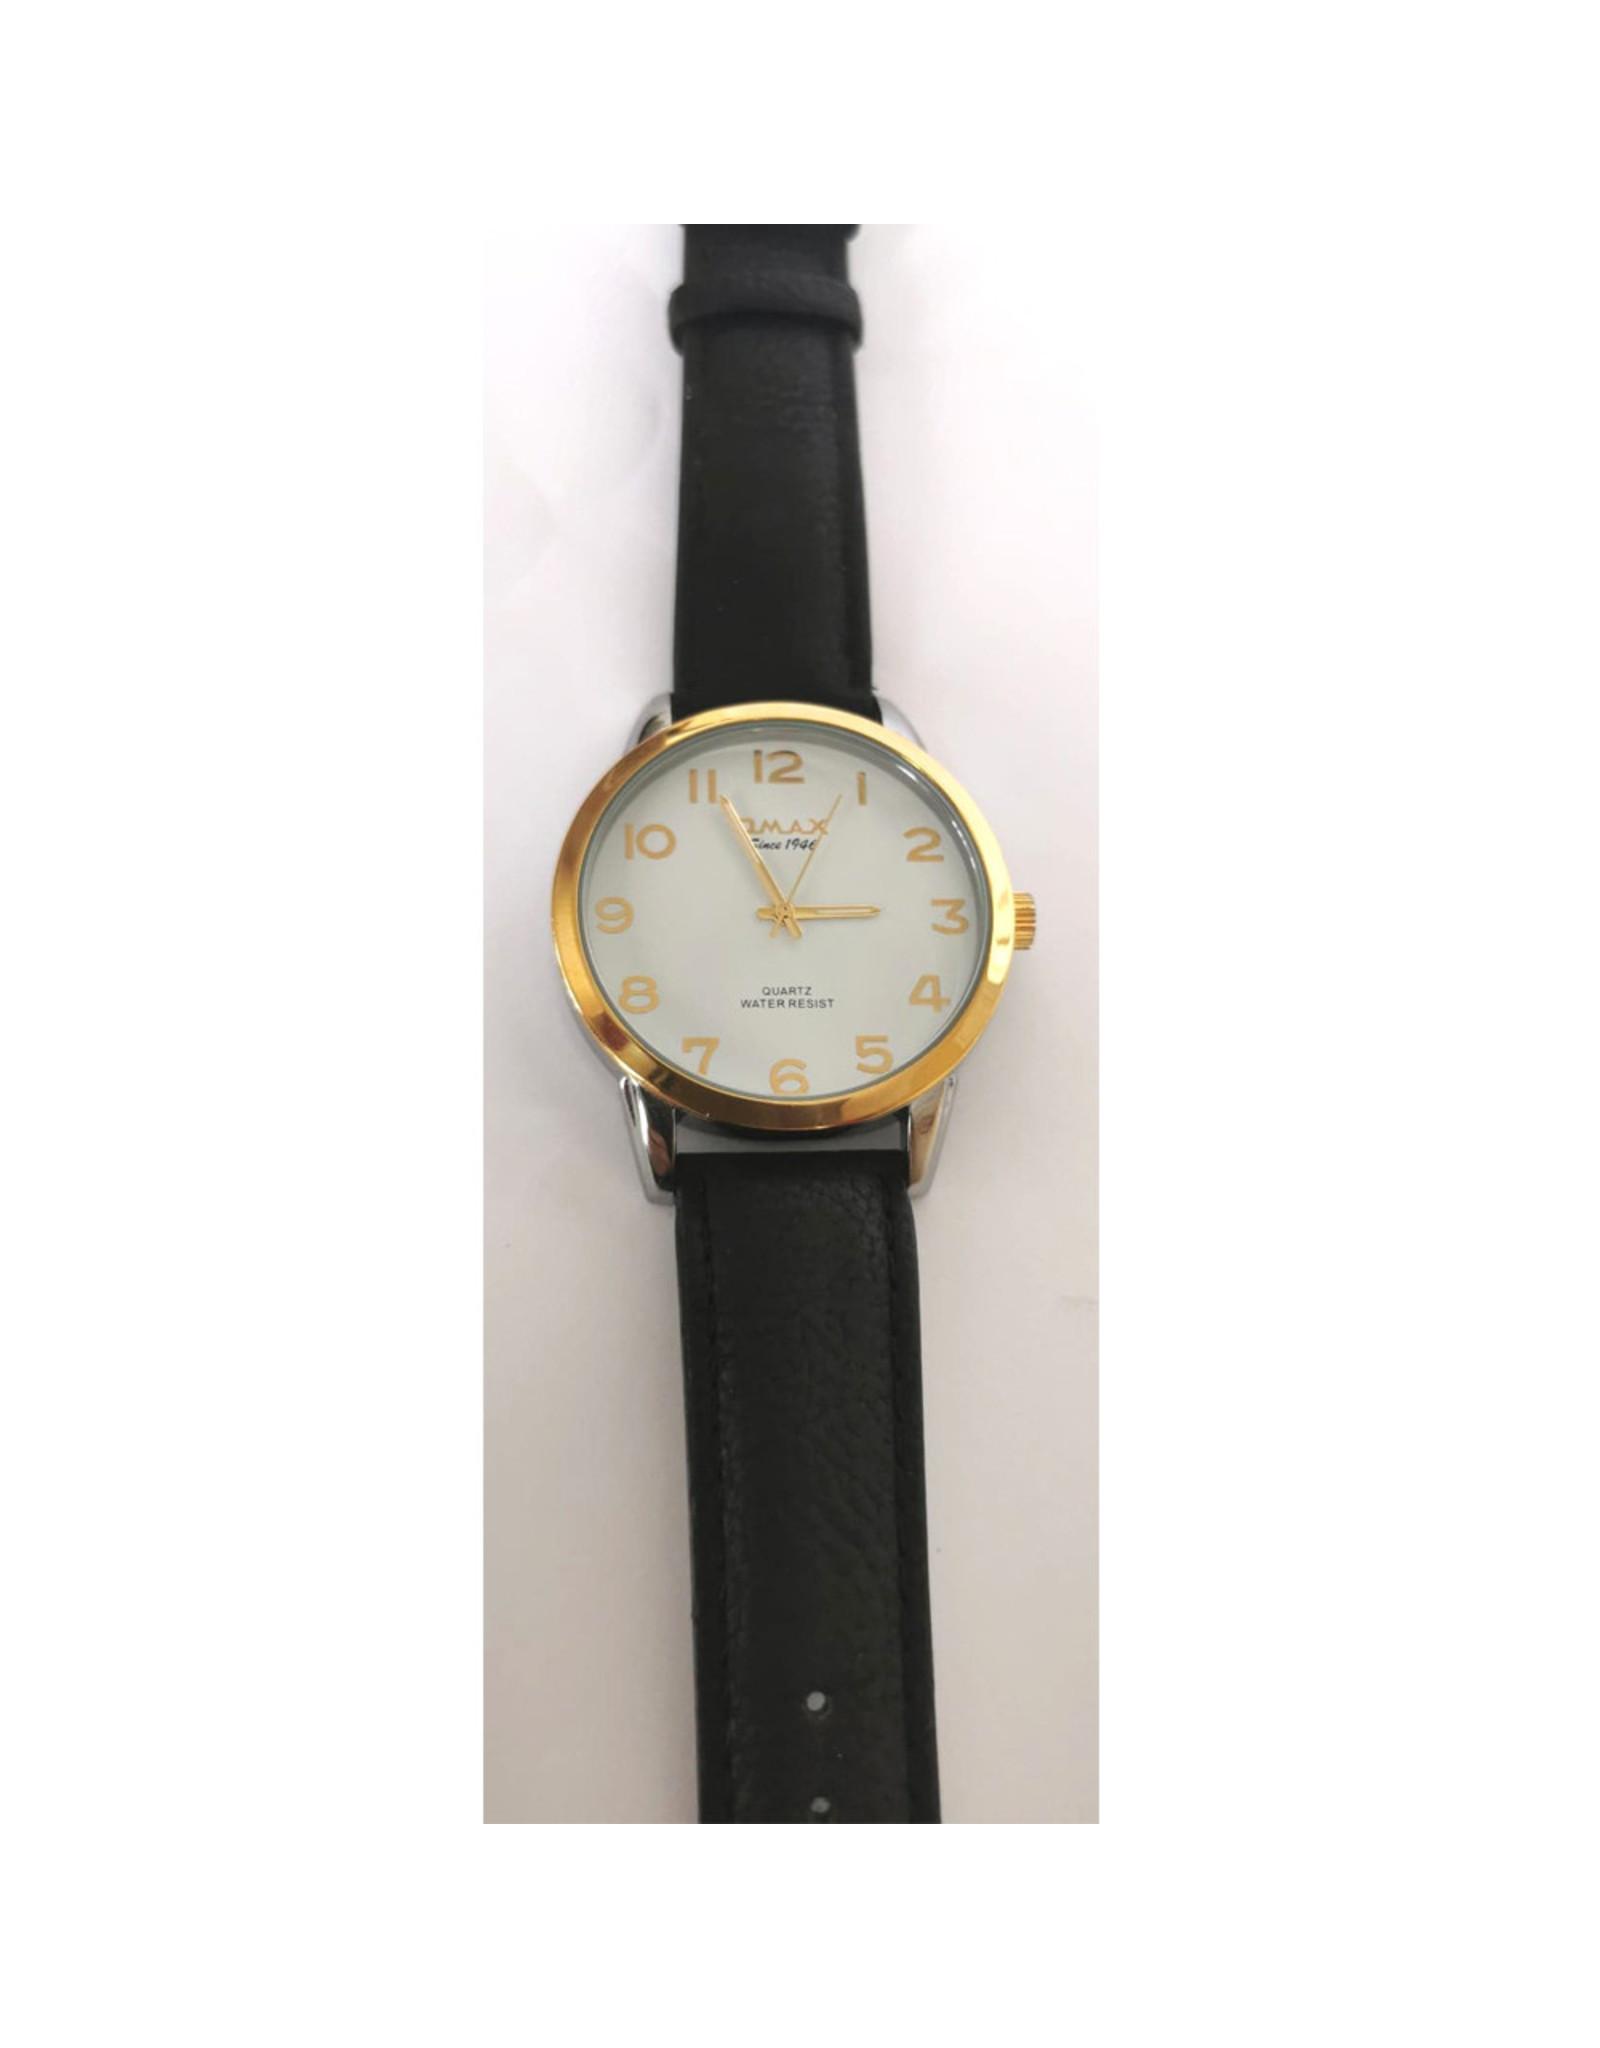 Omax 2 tons, fond blanc, bracelet noir